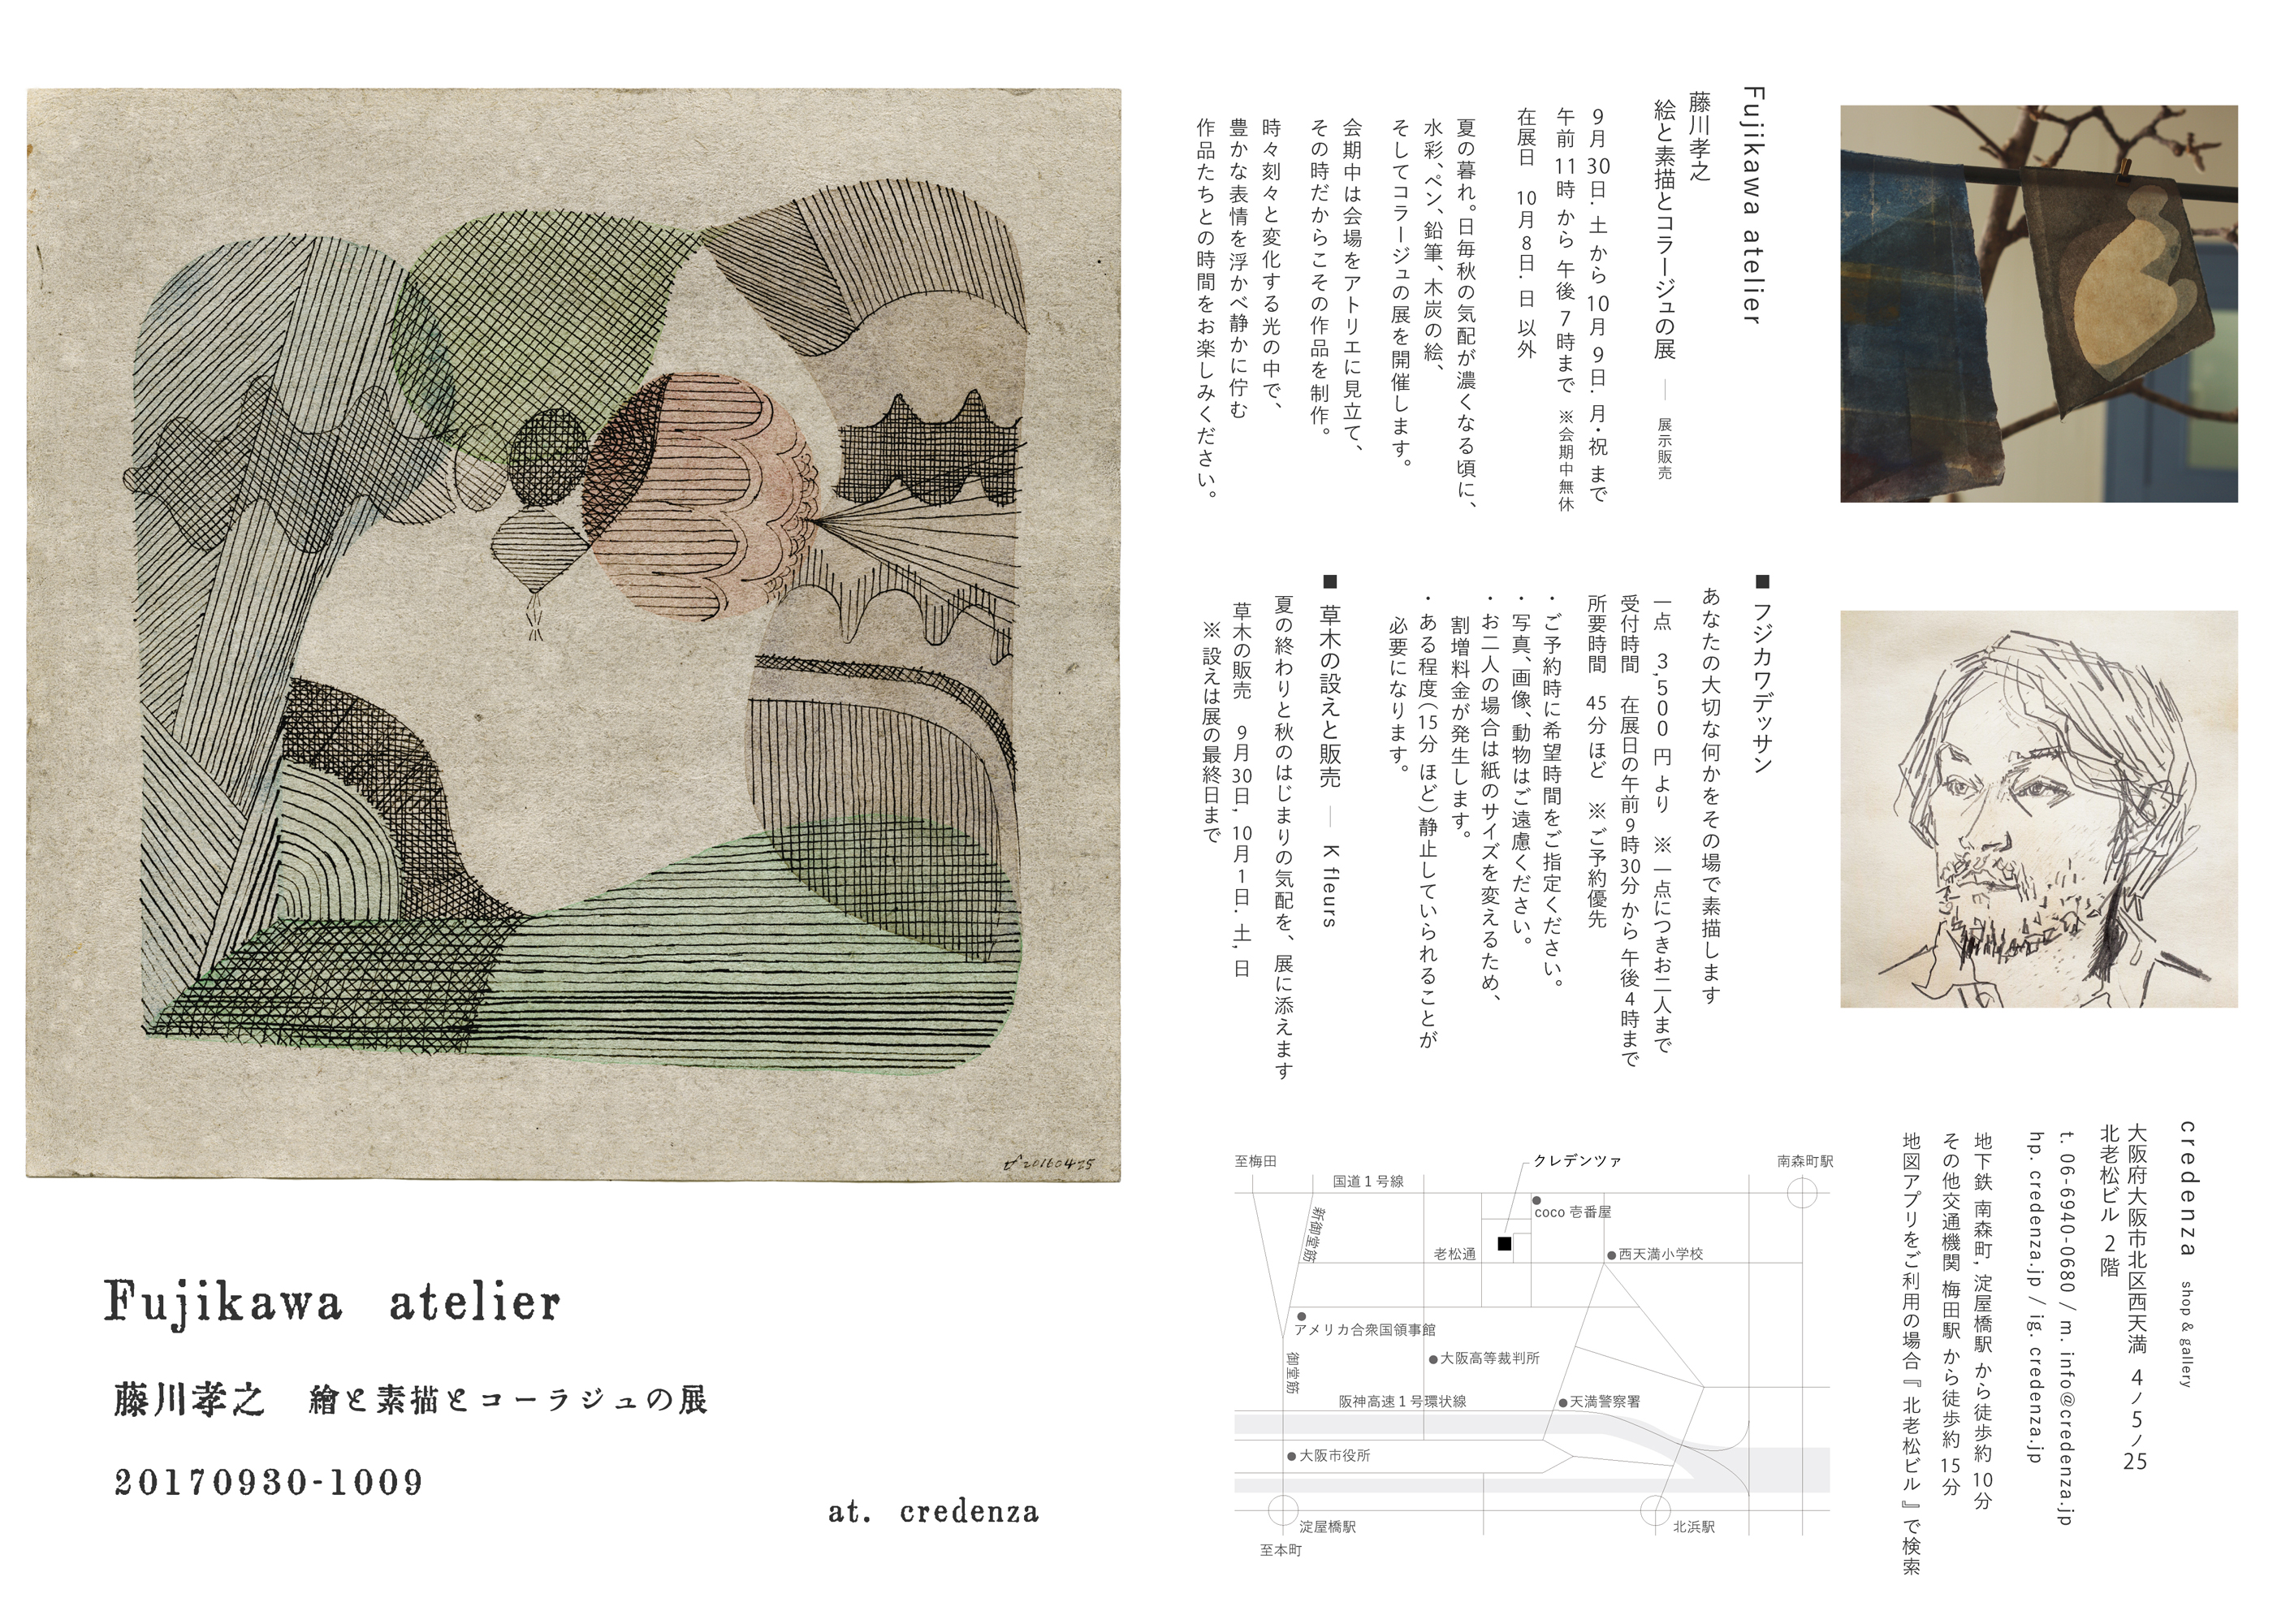 Fujikawa-atelier